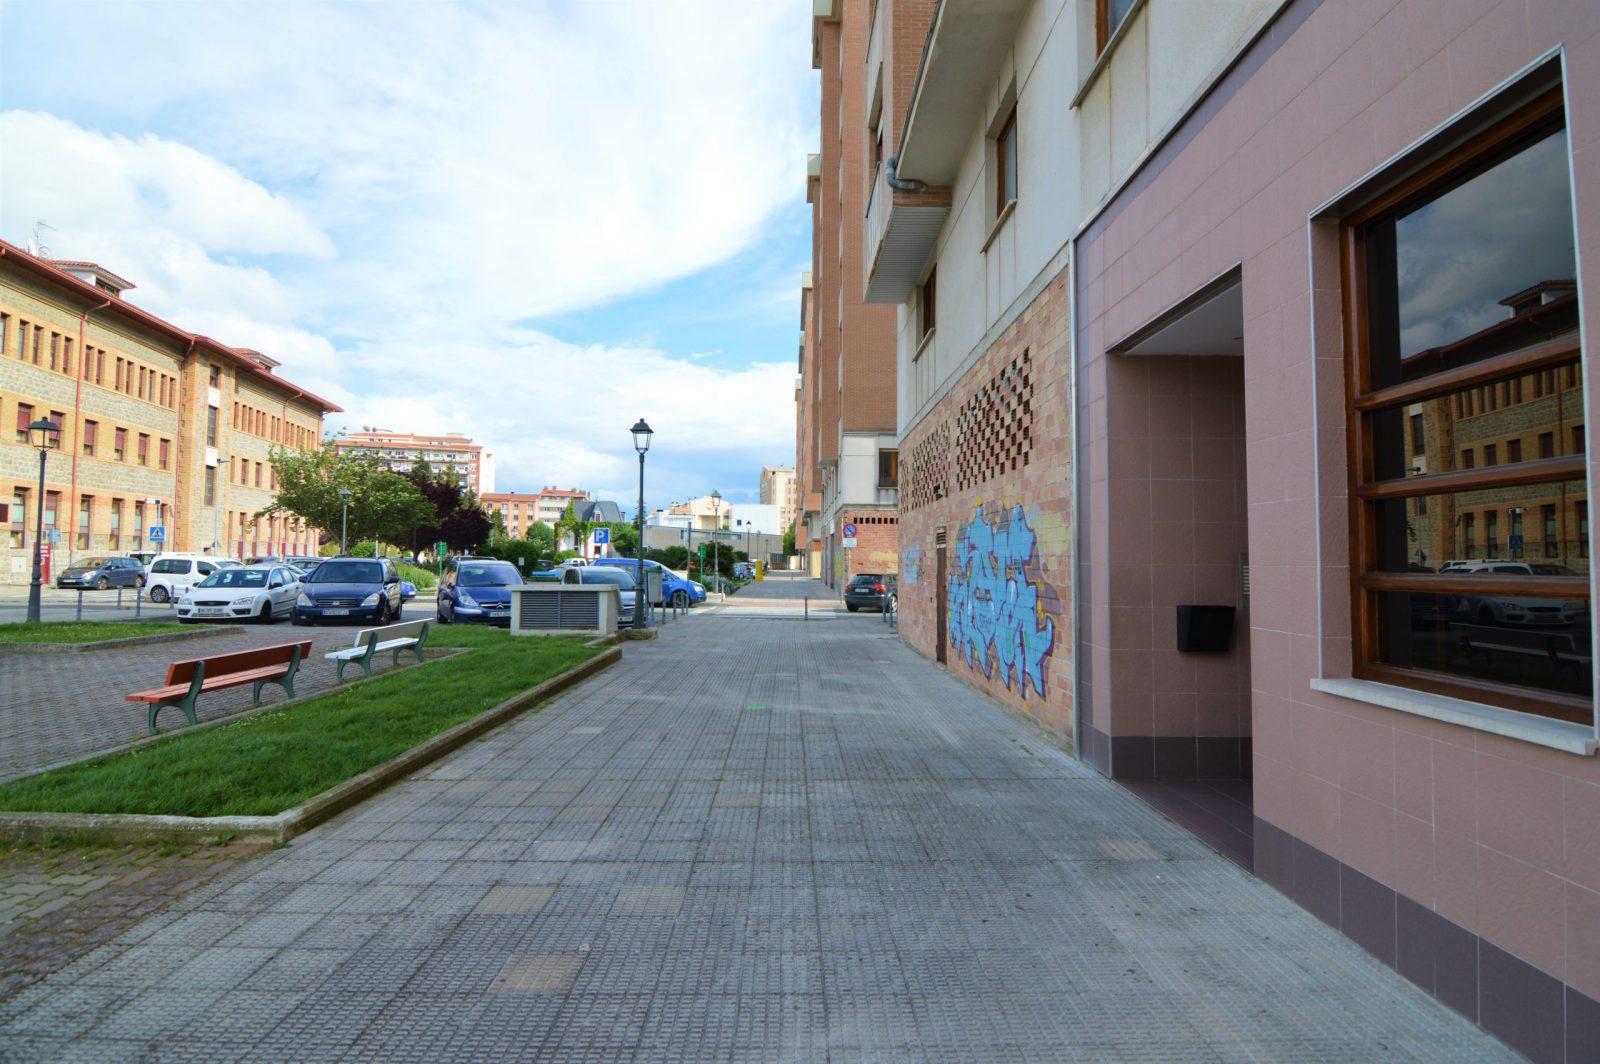 Plaza de garaje Calle Landazabal, 7, S2, 23